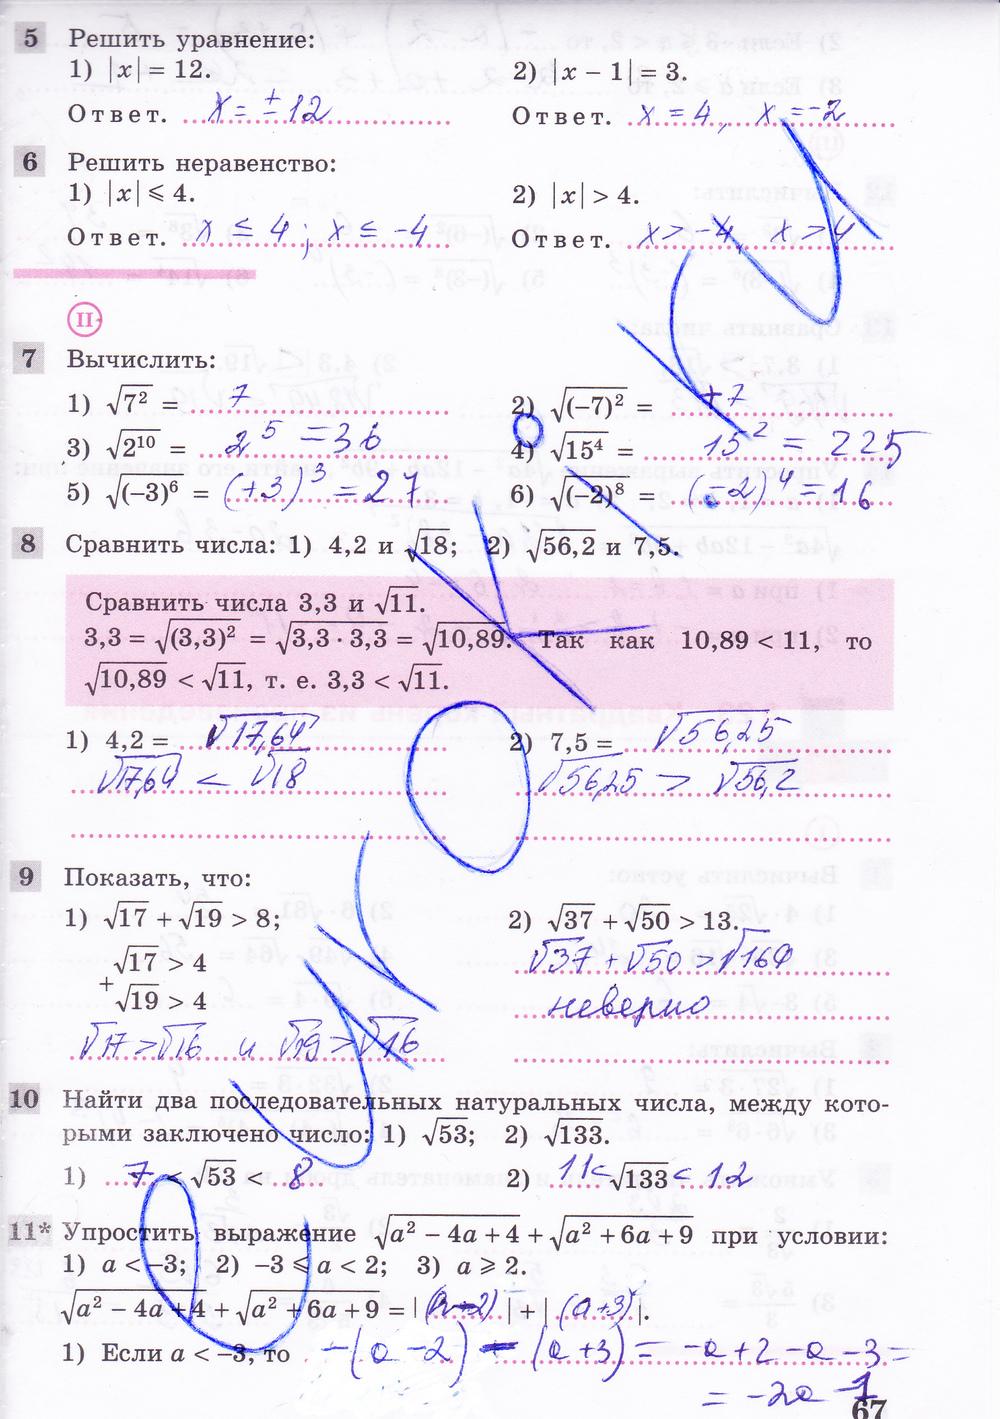 гдз по алгебре 8 класс колягин ткачева федорова шабунин